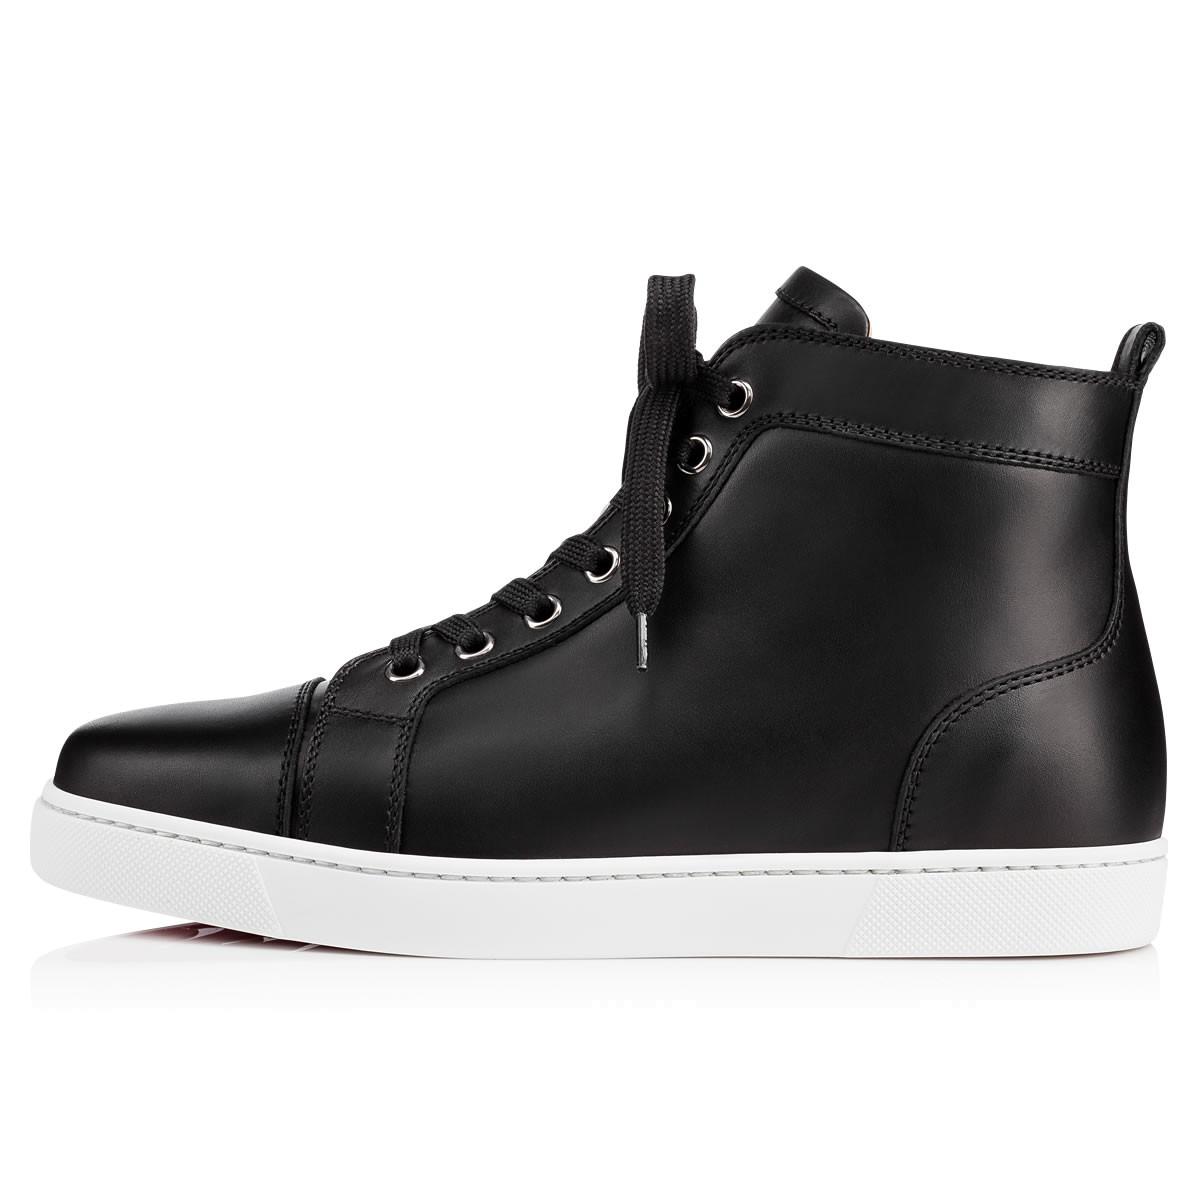 bced6b7a248 LOUIS WOMAN Black Calfskin - Women Shoes - Christian Louboutin